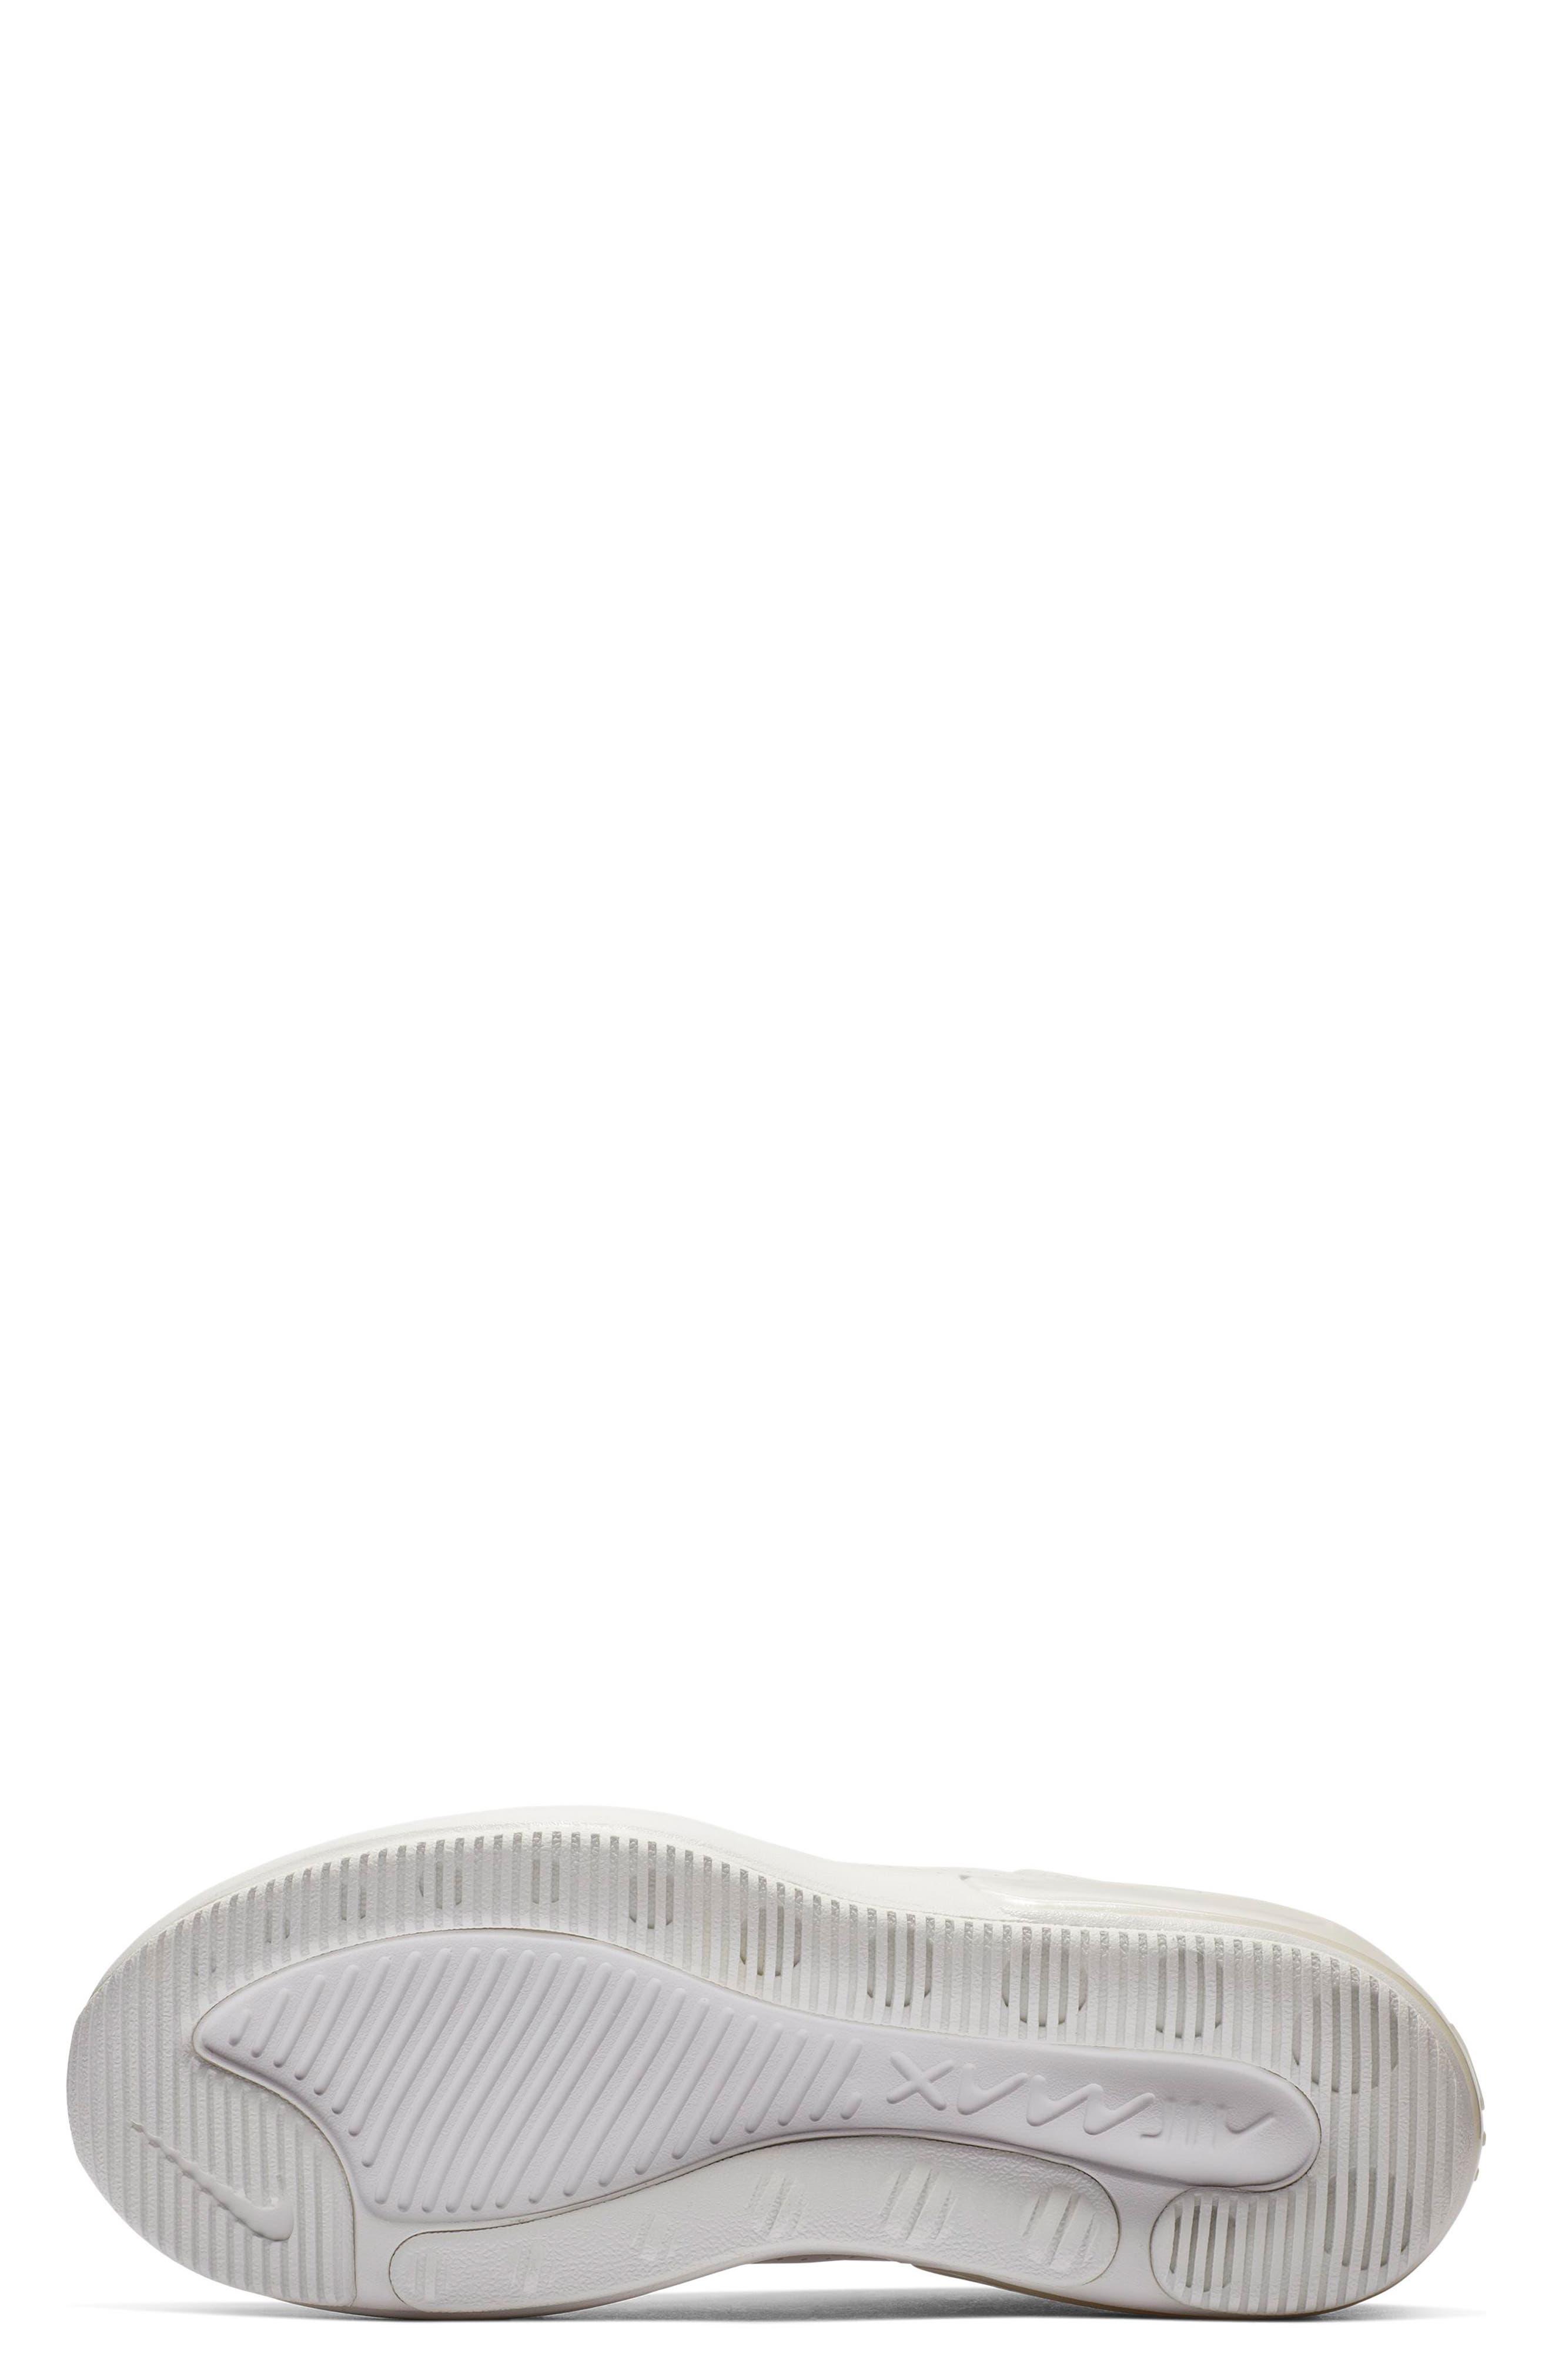 NIKE, Air Max DIA SE Running Shoe, Alternate thumbnail 4, color, WHITE/ ALUMINUM/ WHITE